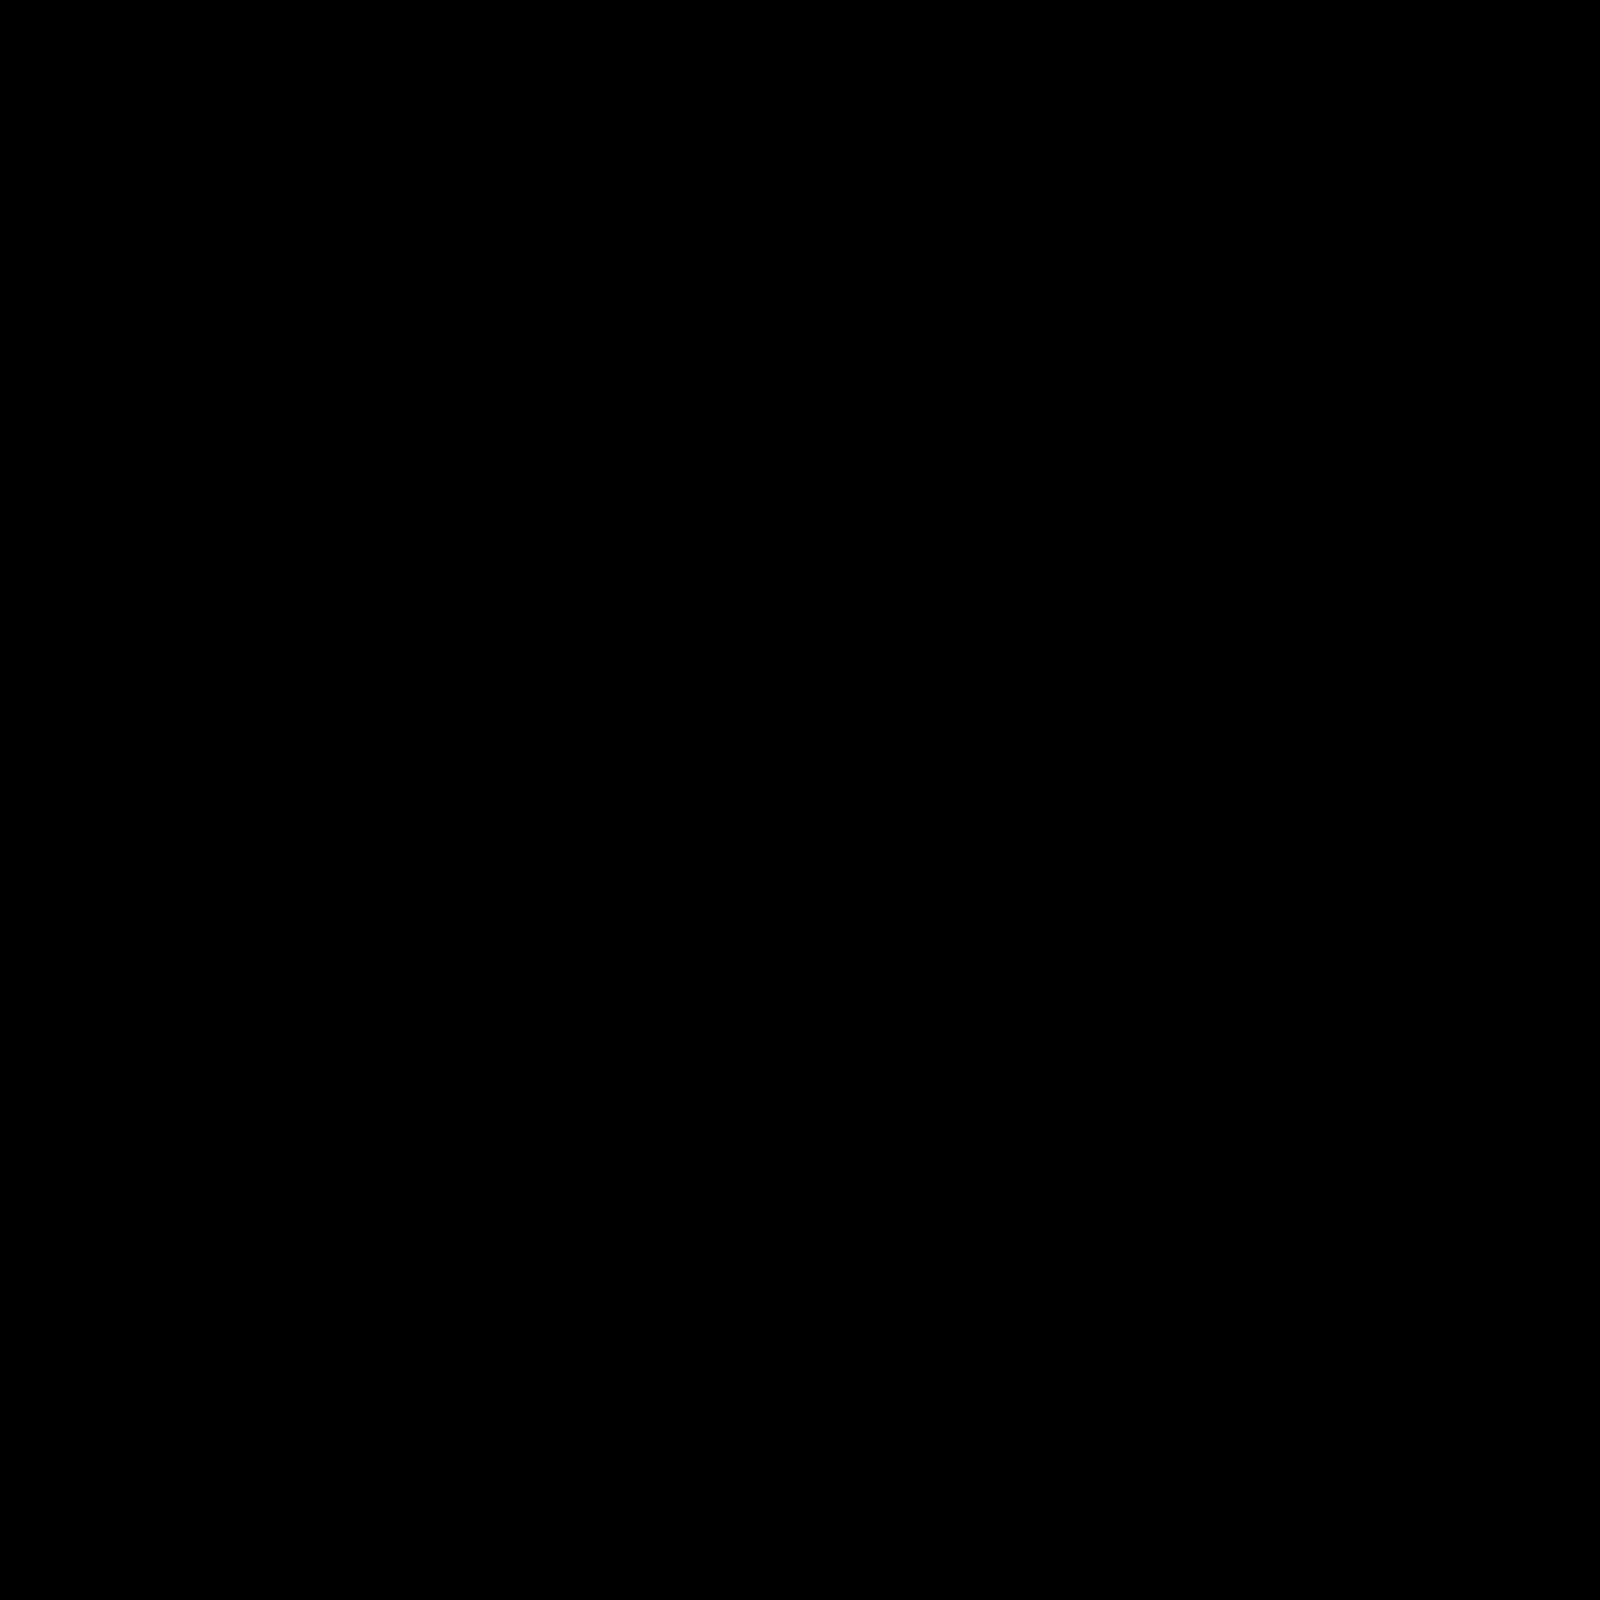 PNG Footprint - 154333